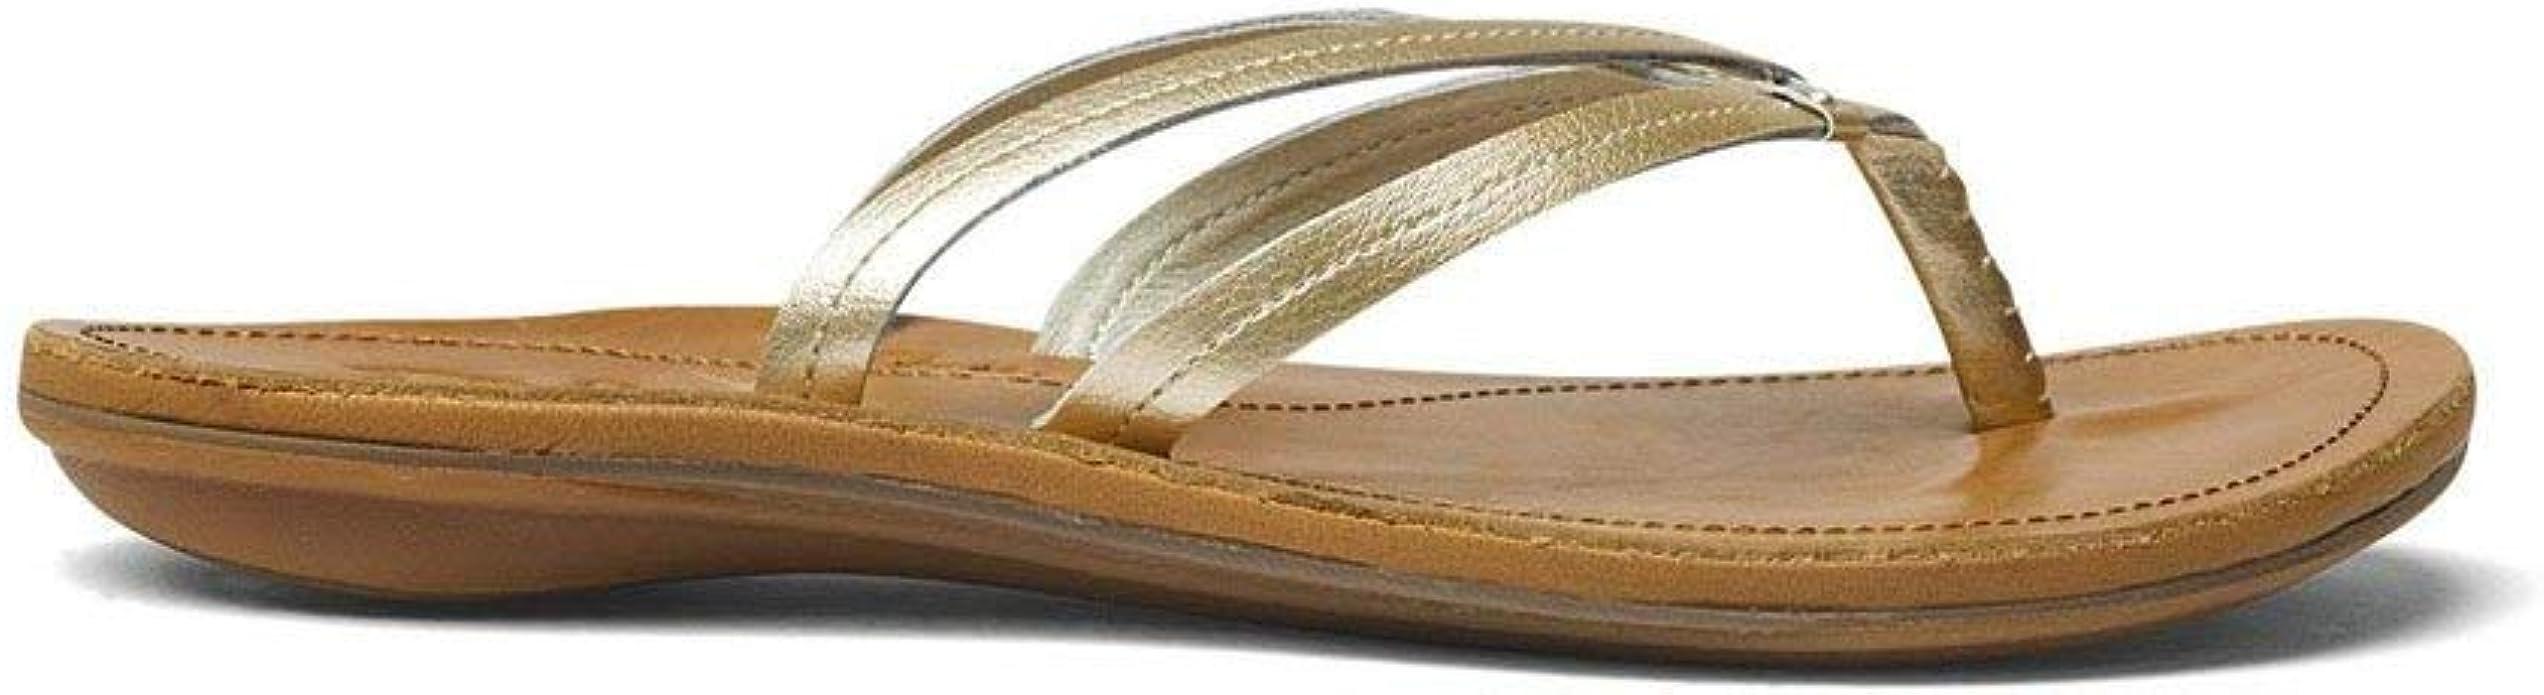 Sahara Women/'s Casual Leather Thong Sandals 20245-FAFM OluKai U/'I Bubbly